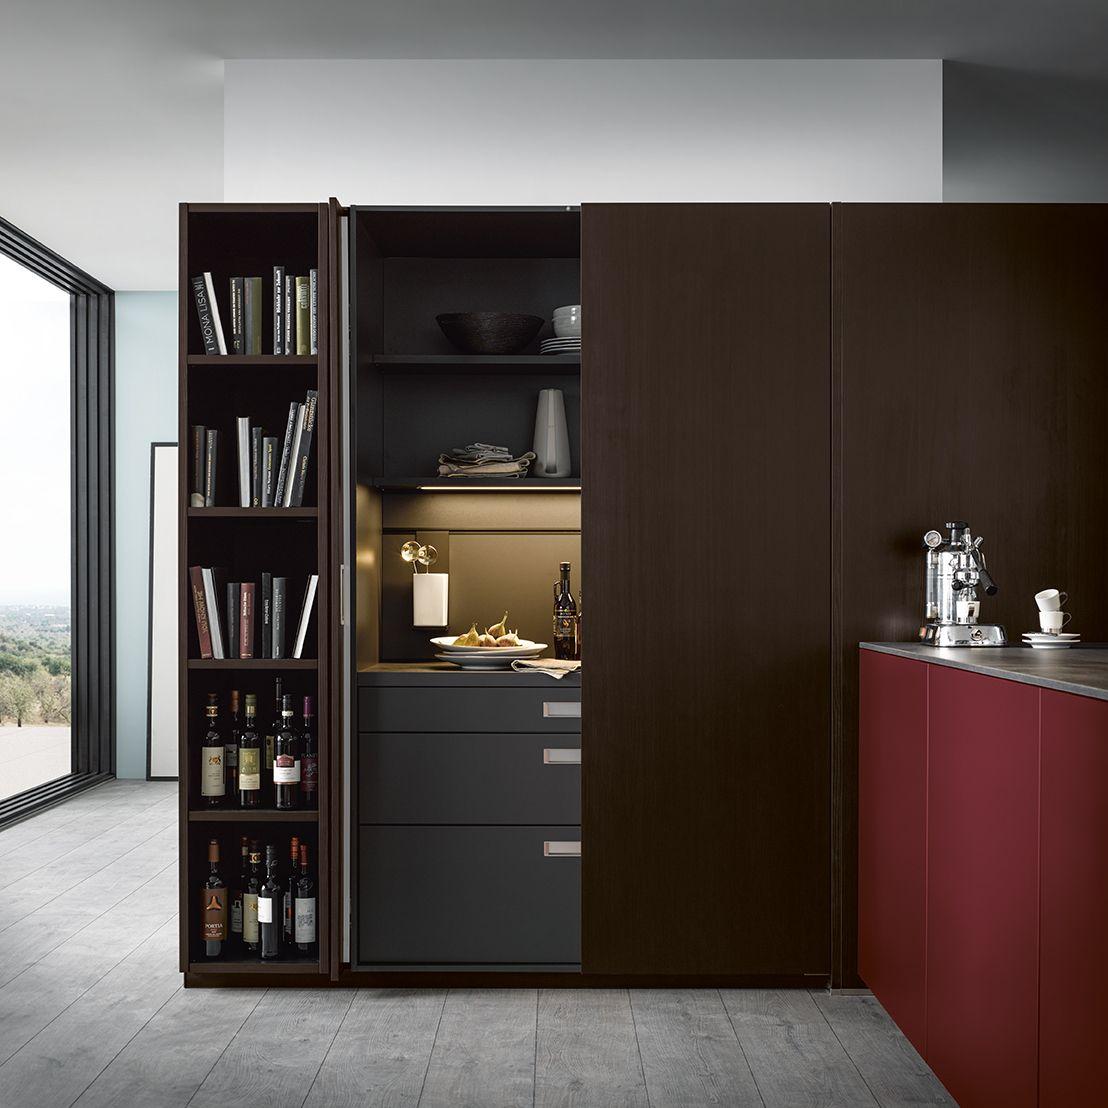 Next125 Kitchens -  NX640 Elegant oak Tobacco